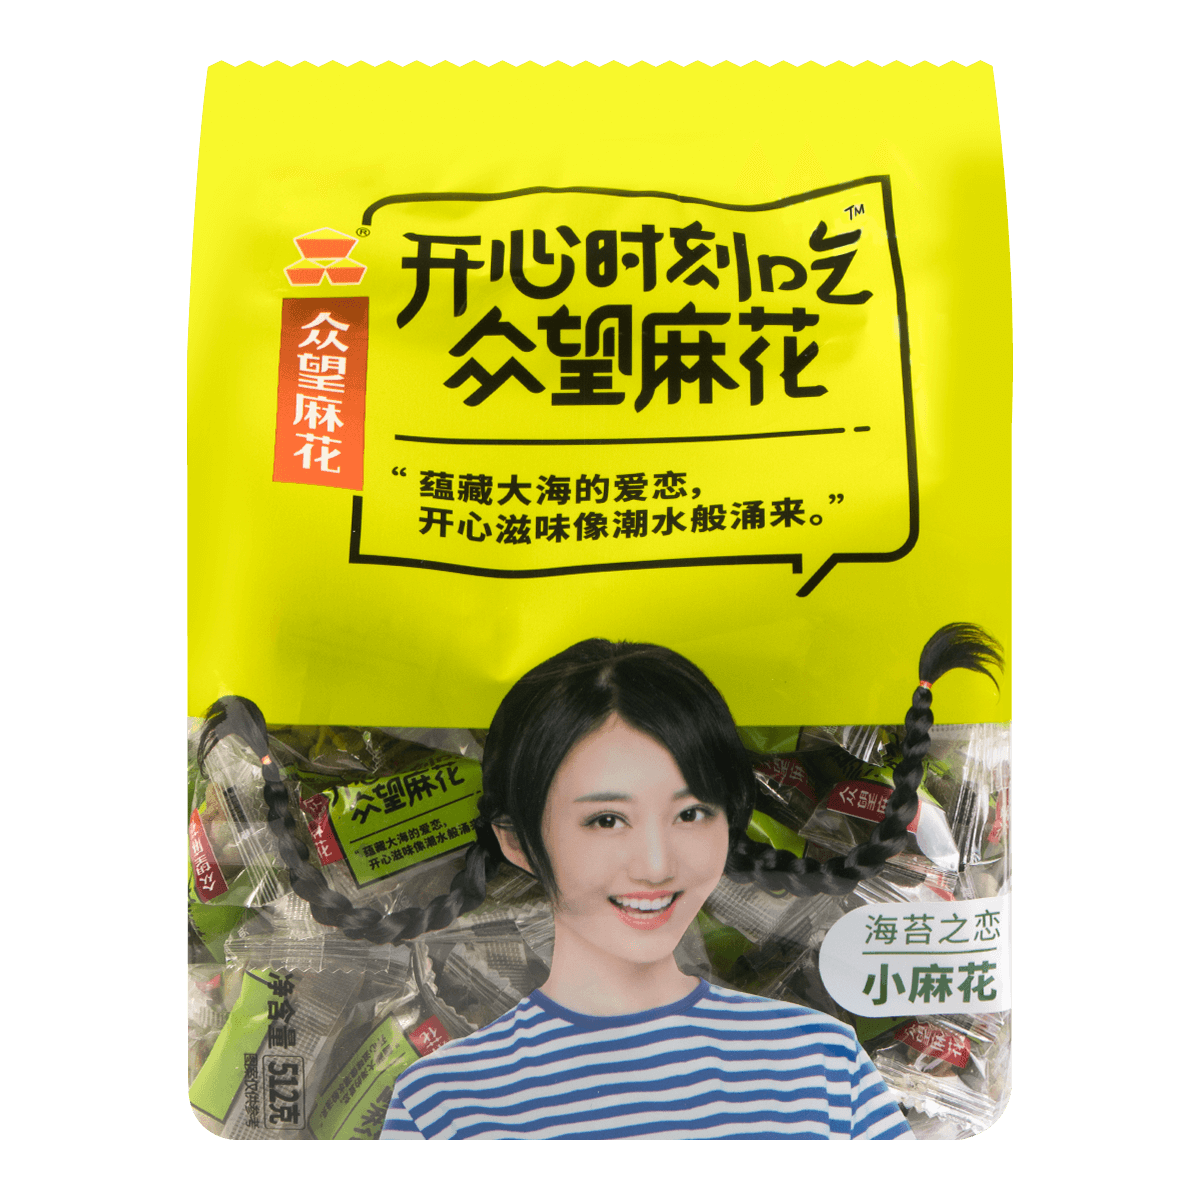 ZHONHGWANG Seaweed Flavor a Crisp Dough Twist 512g